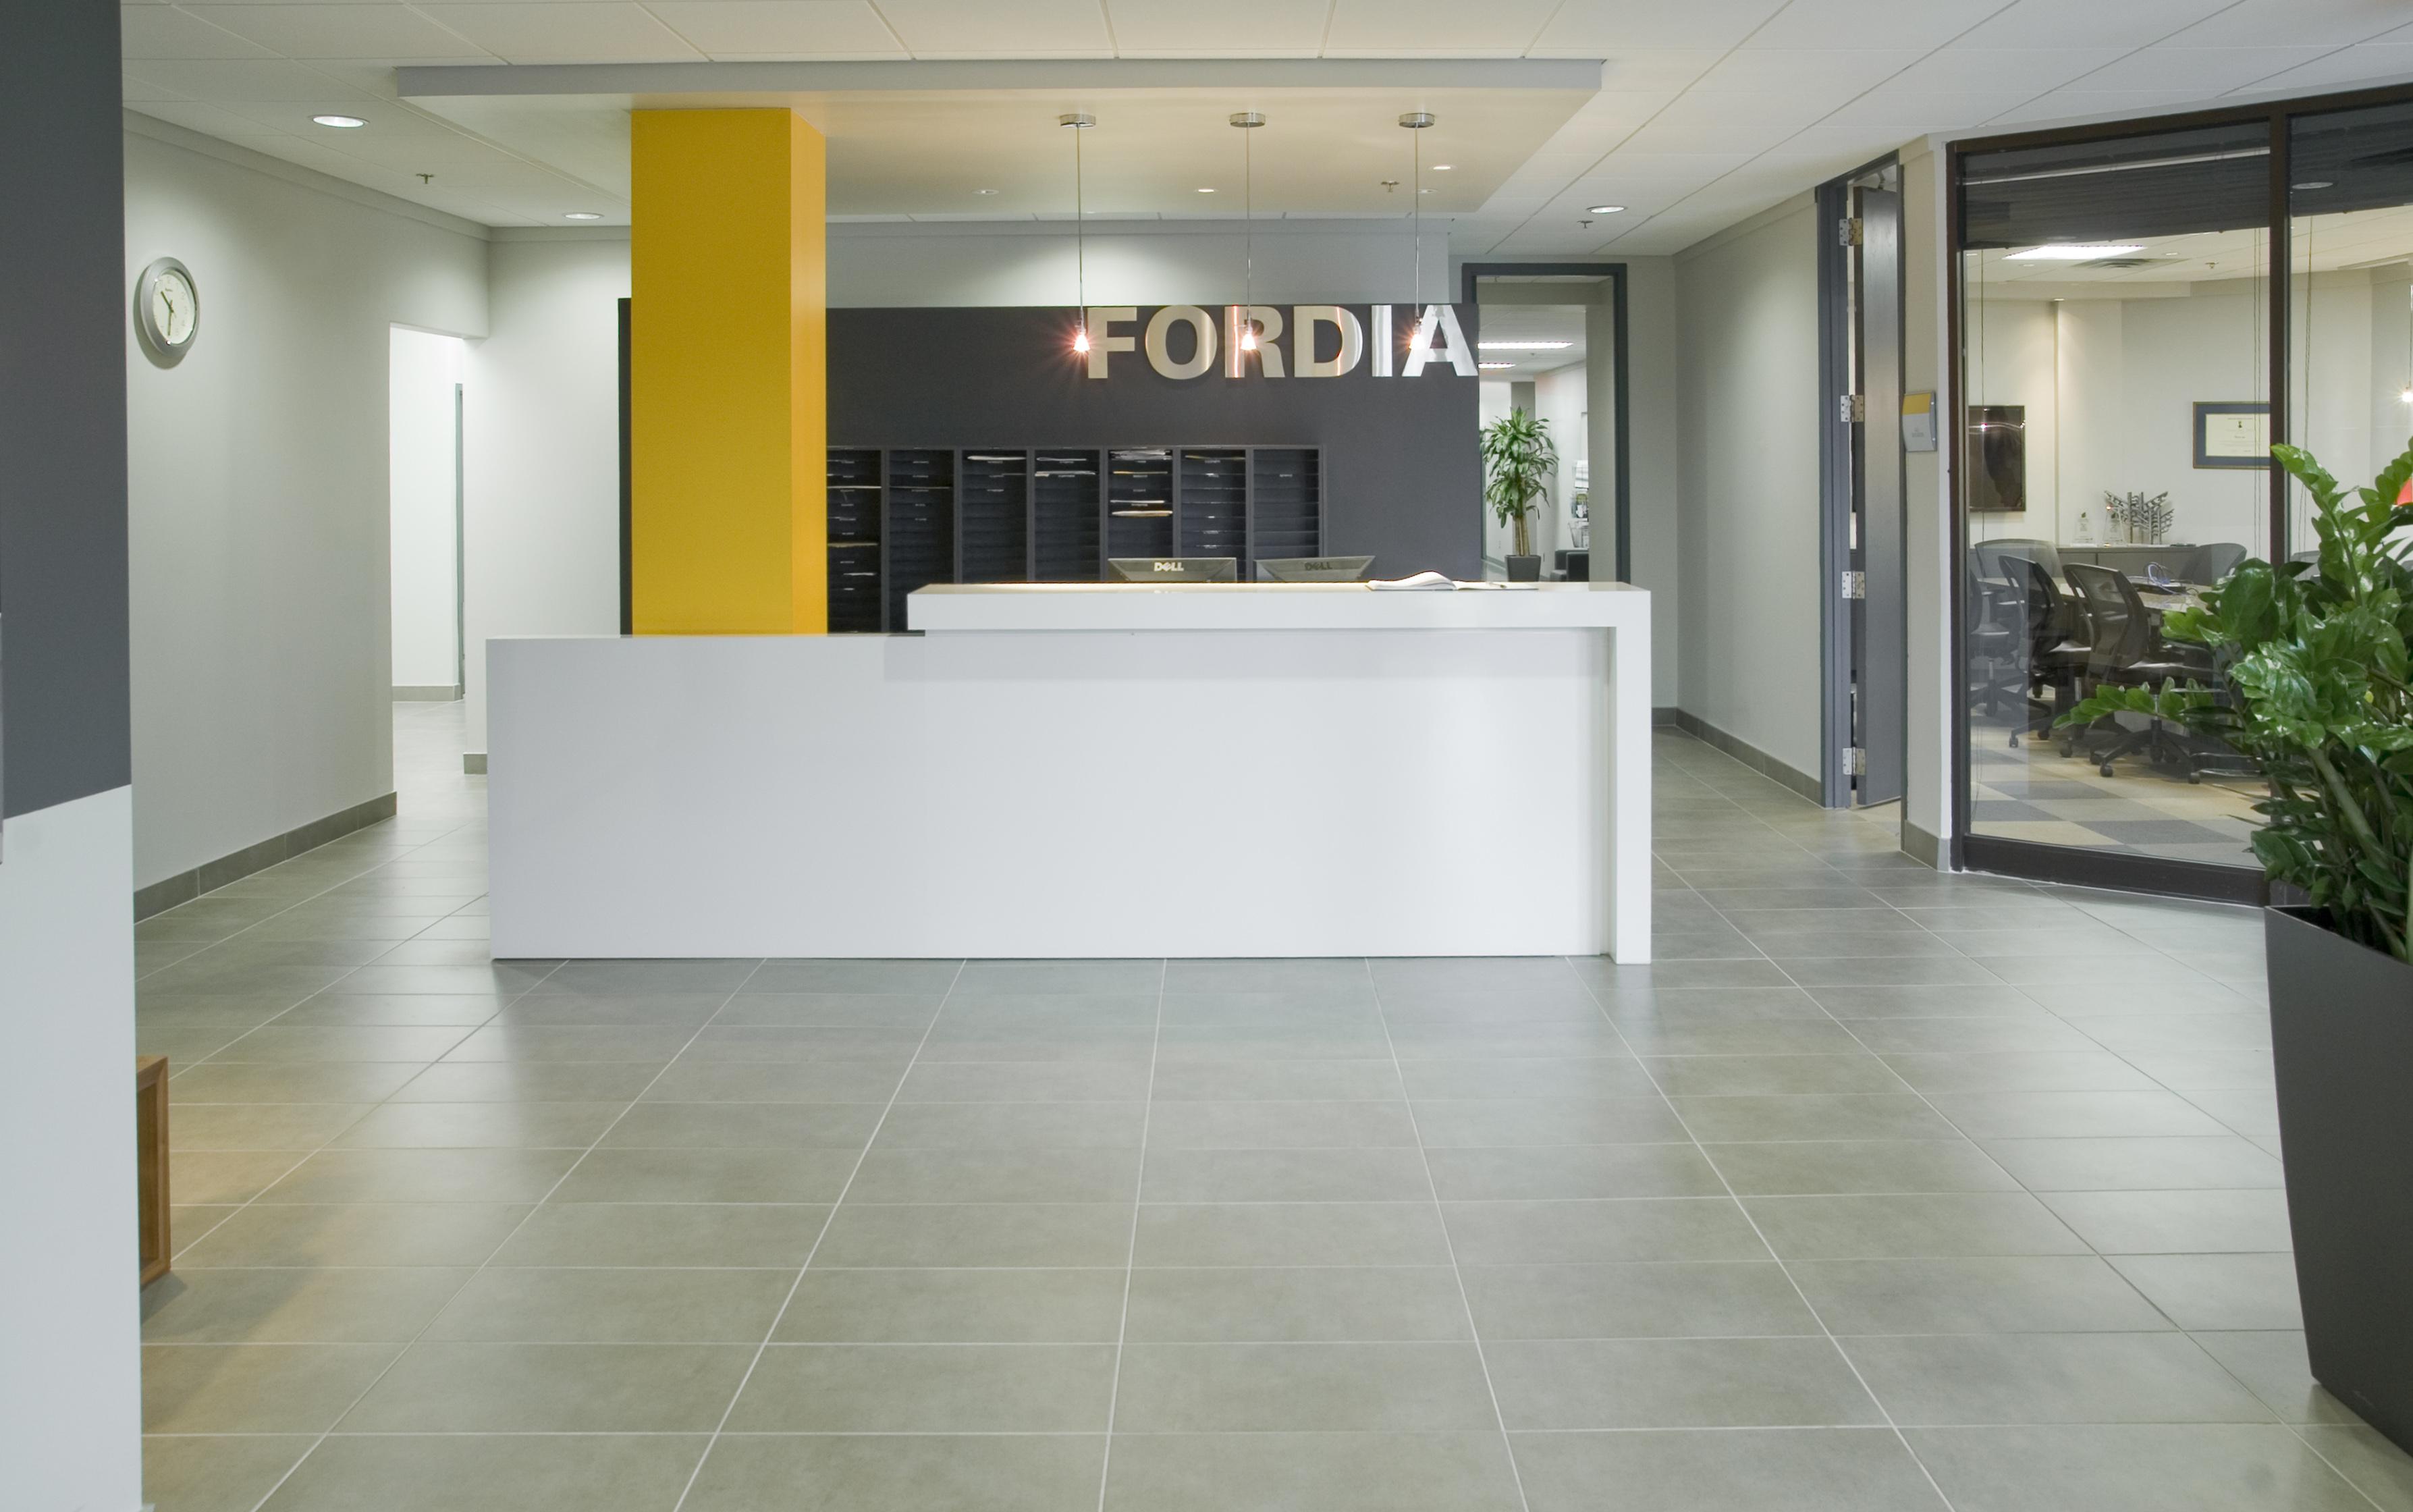 Fordia_RÉCEPTION